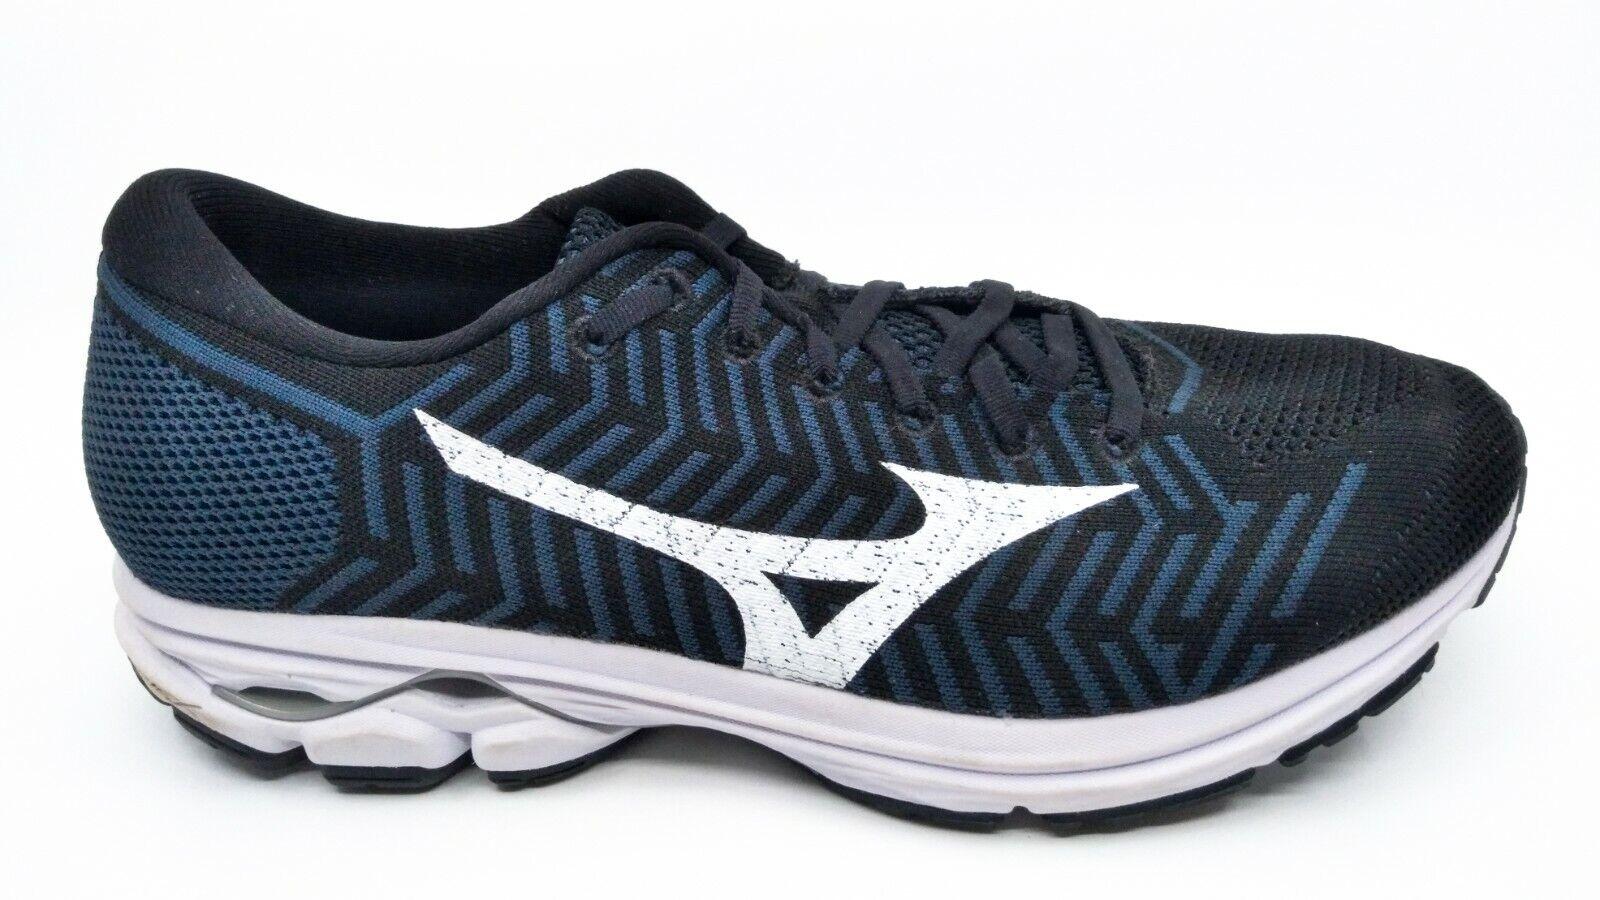 Mizuno Waveknit R2 Men's Athletic Cushioned Running Shoes Size 10 J1GC182901